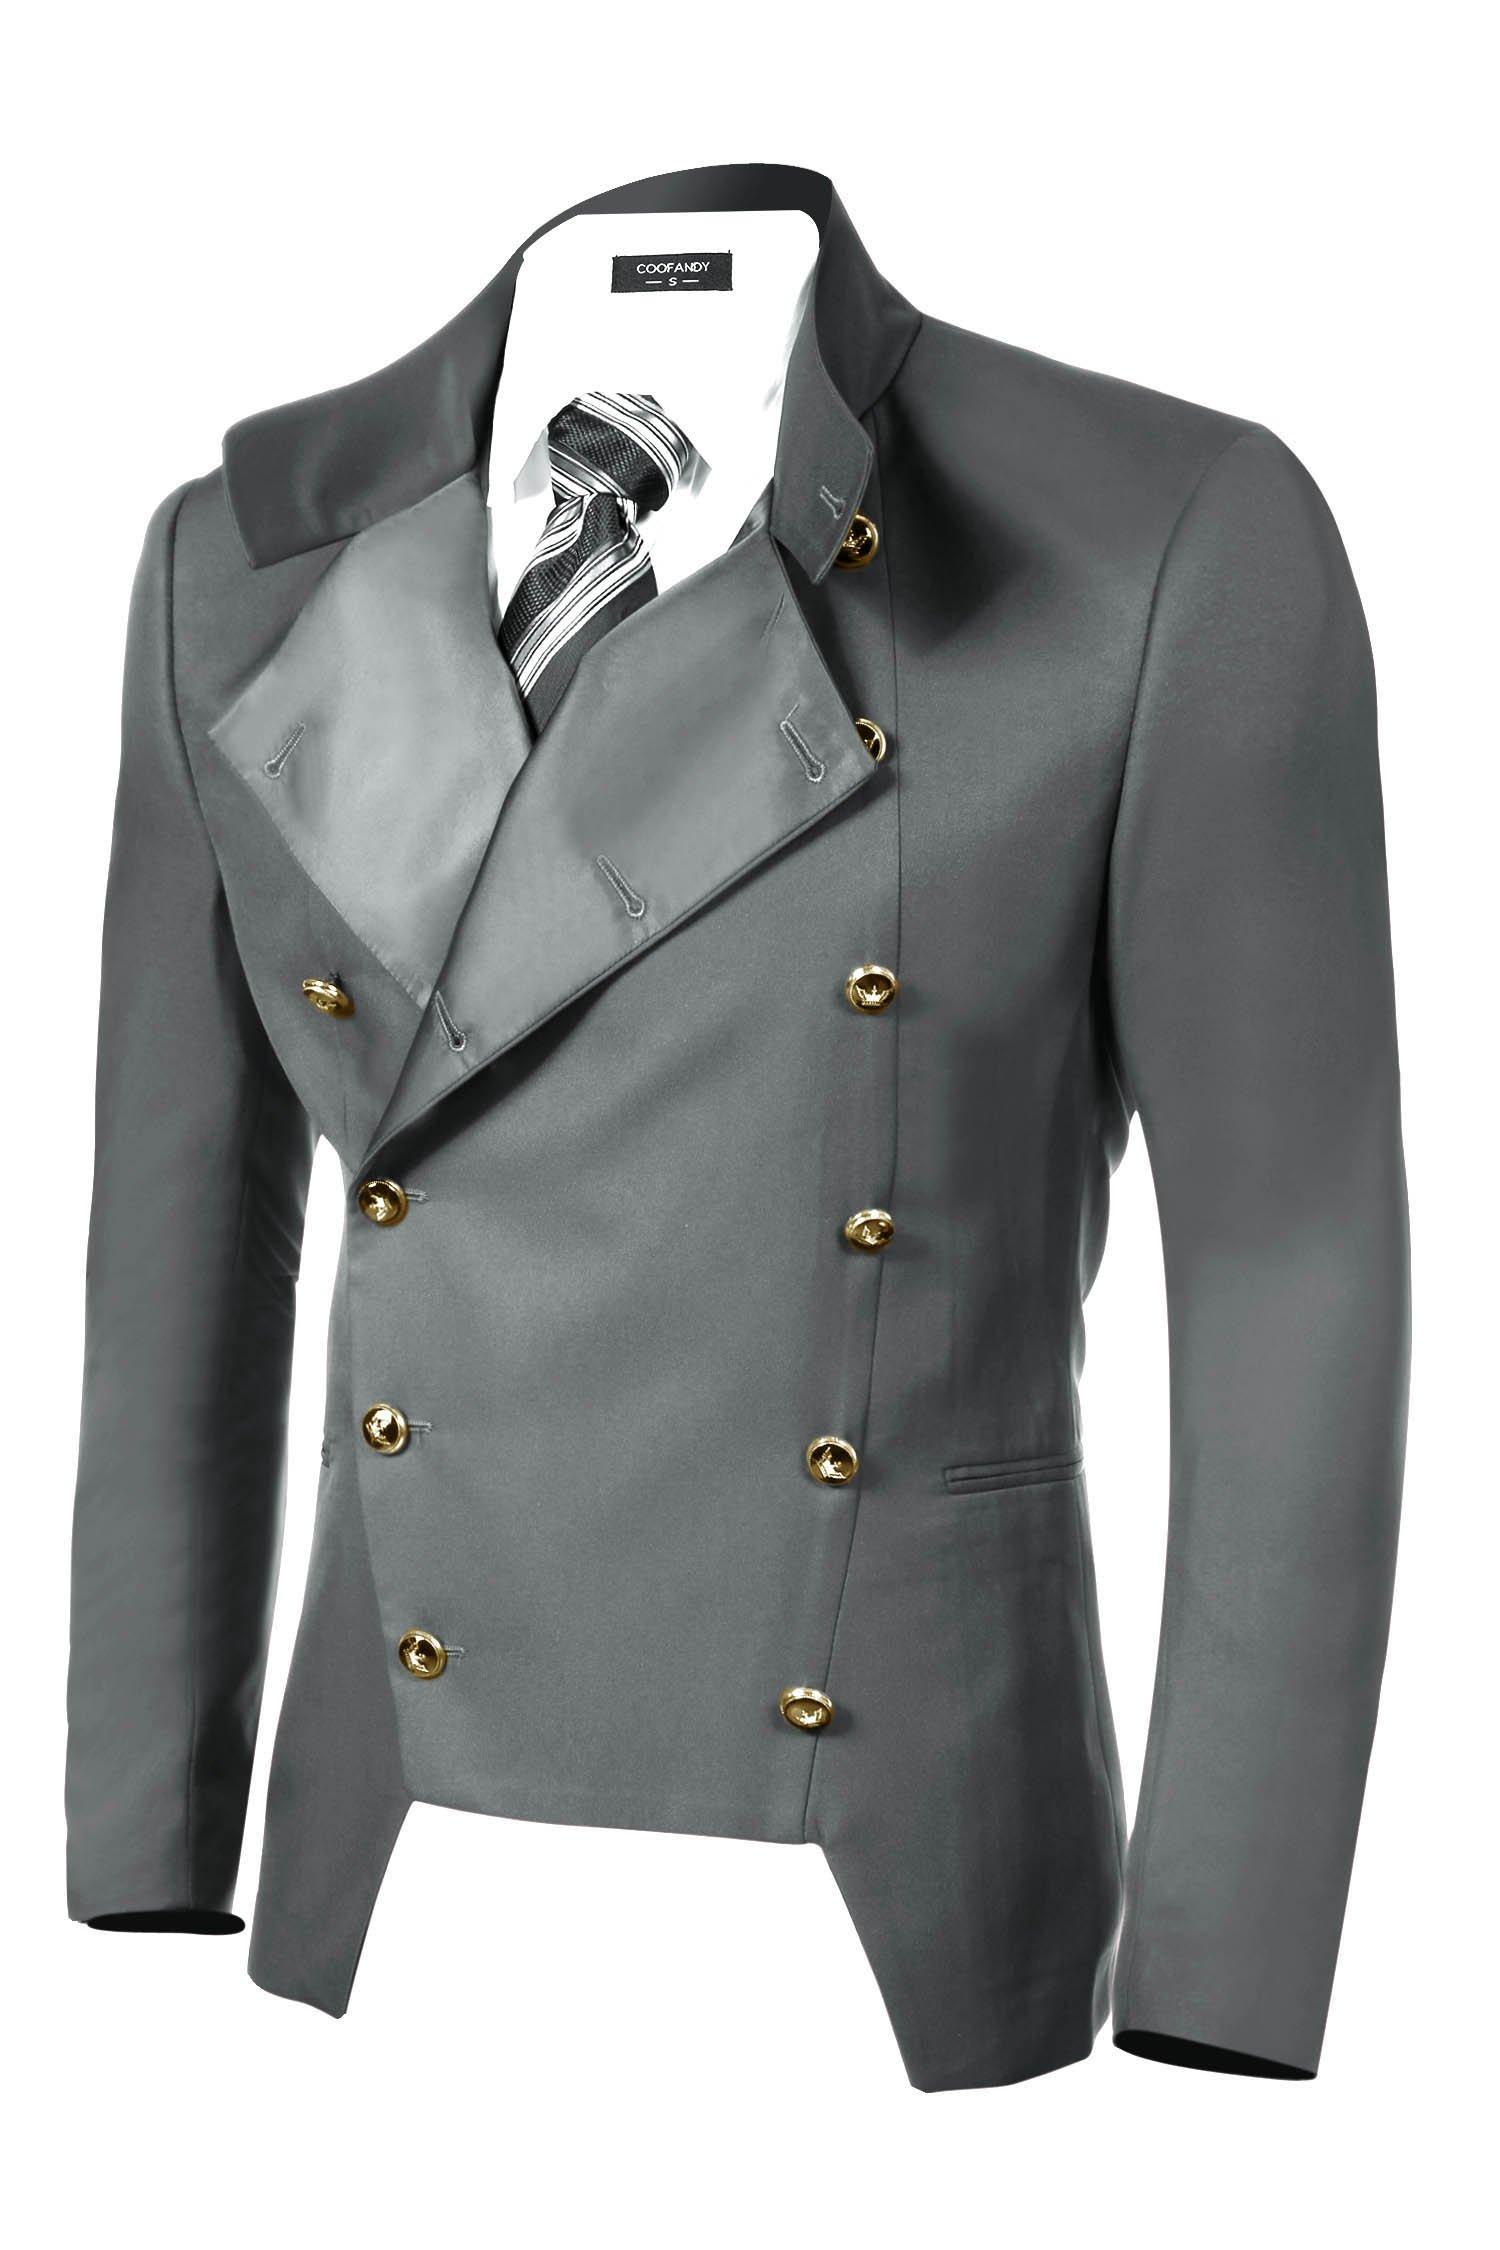 COOFANDY Men's Casual Double-Breasted Jacket Slim Fit Blazer (Medium, Gray)